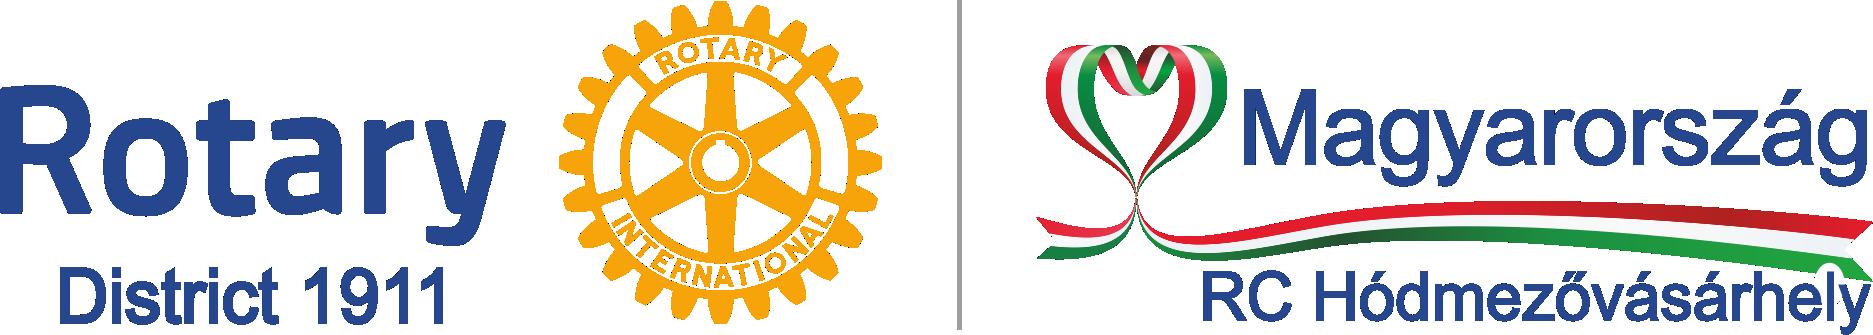 Rotary logo HMVHELY_nagy